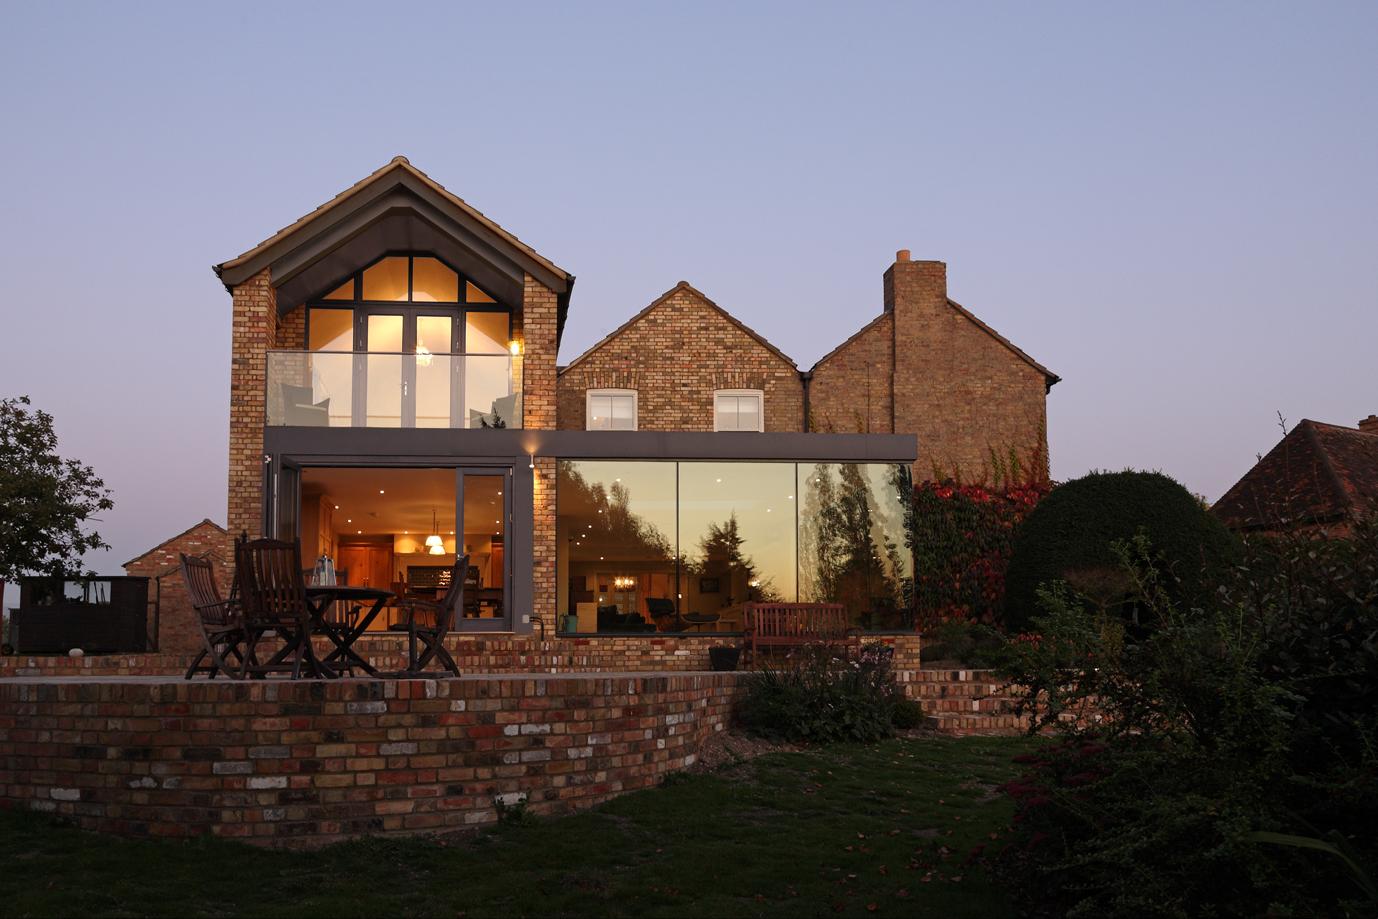 grafham water cambridgeshire nicolas tye architects development. Black Bedroom Furniture Sets. Home Design Ideas